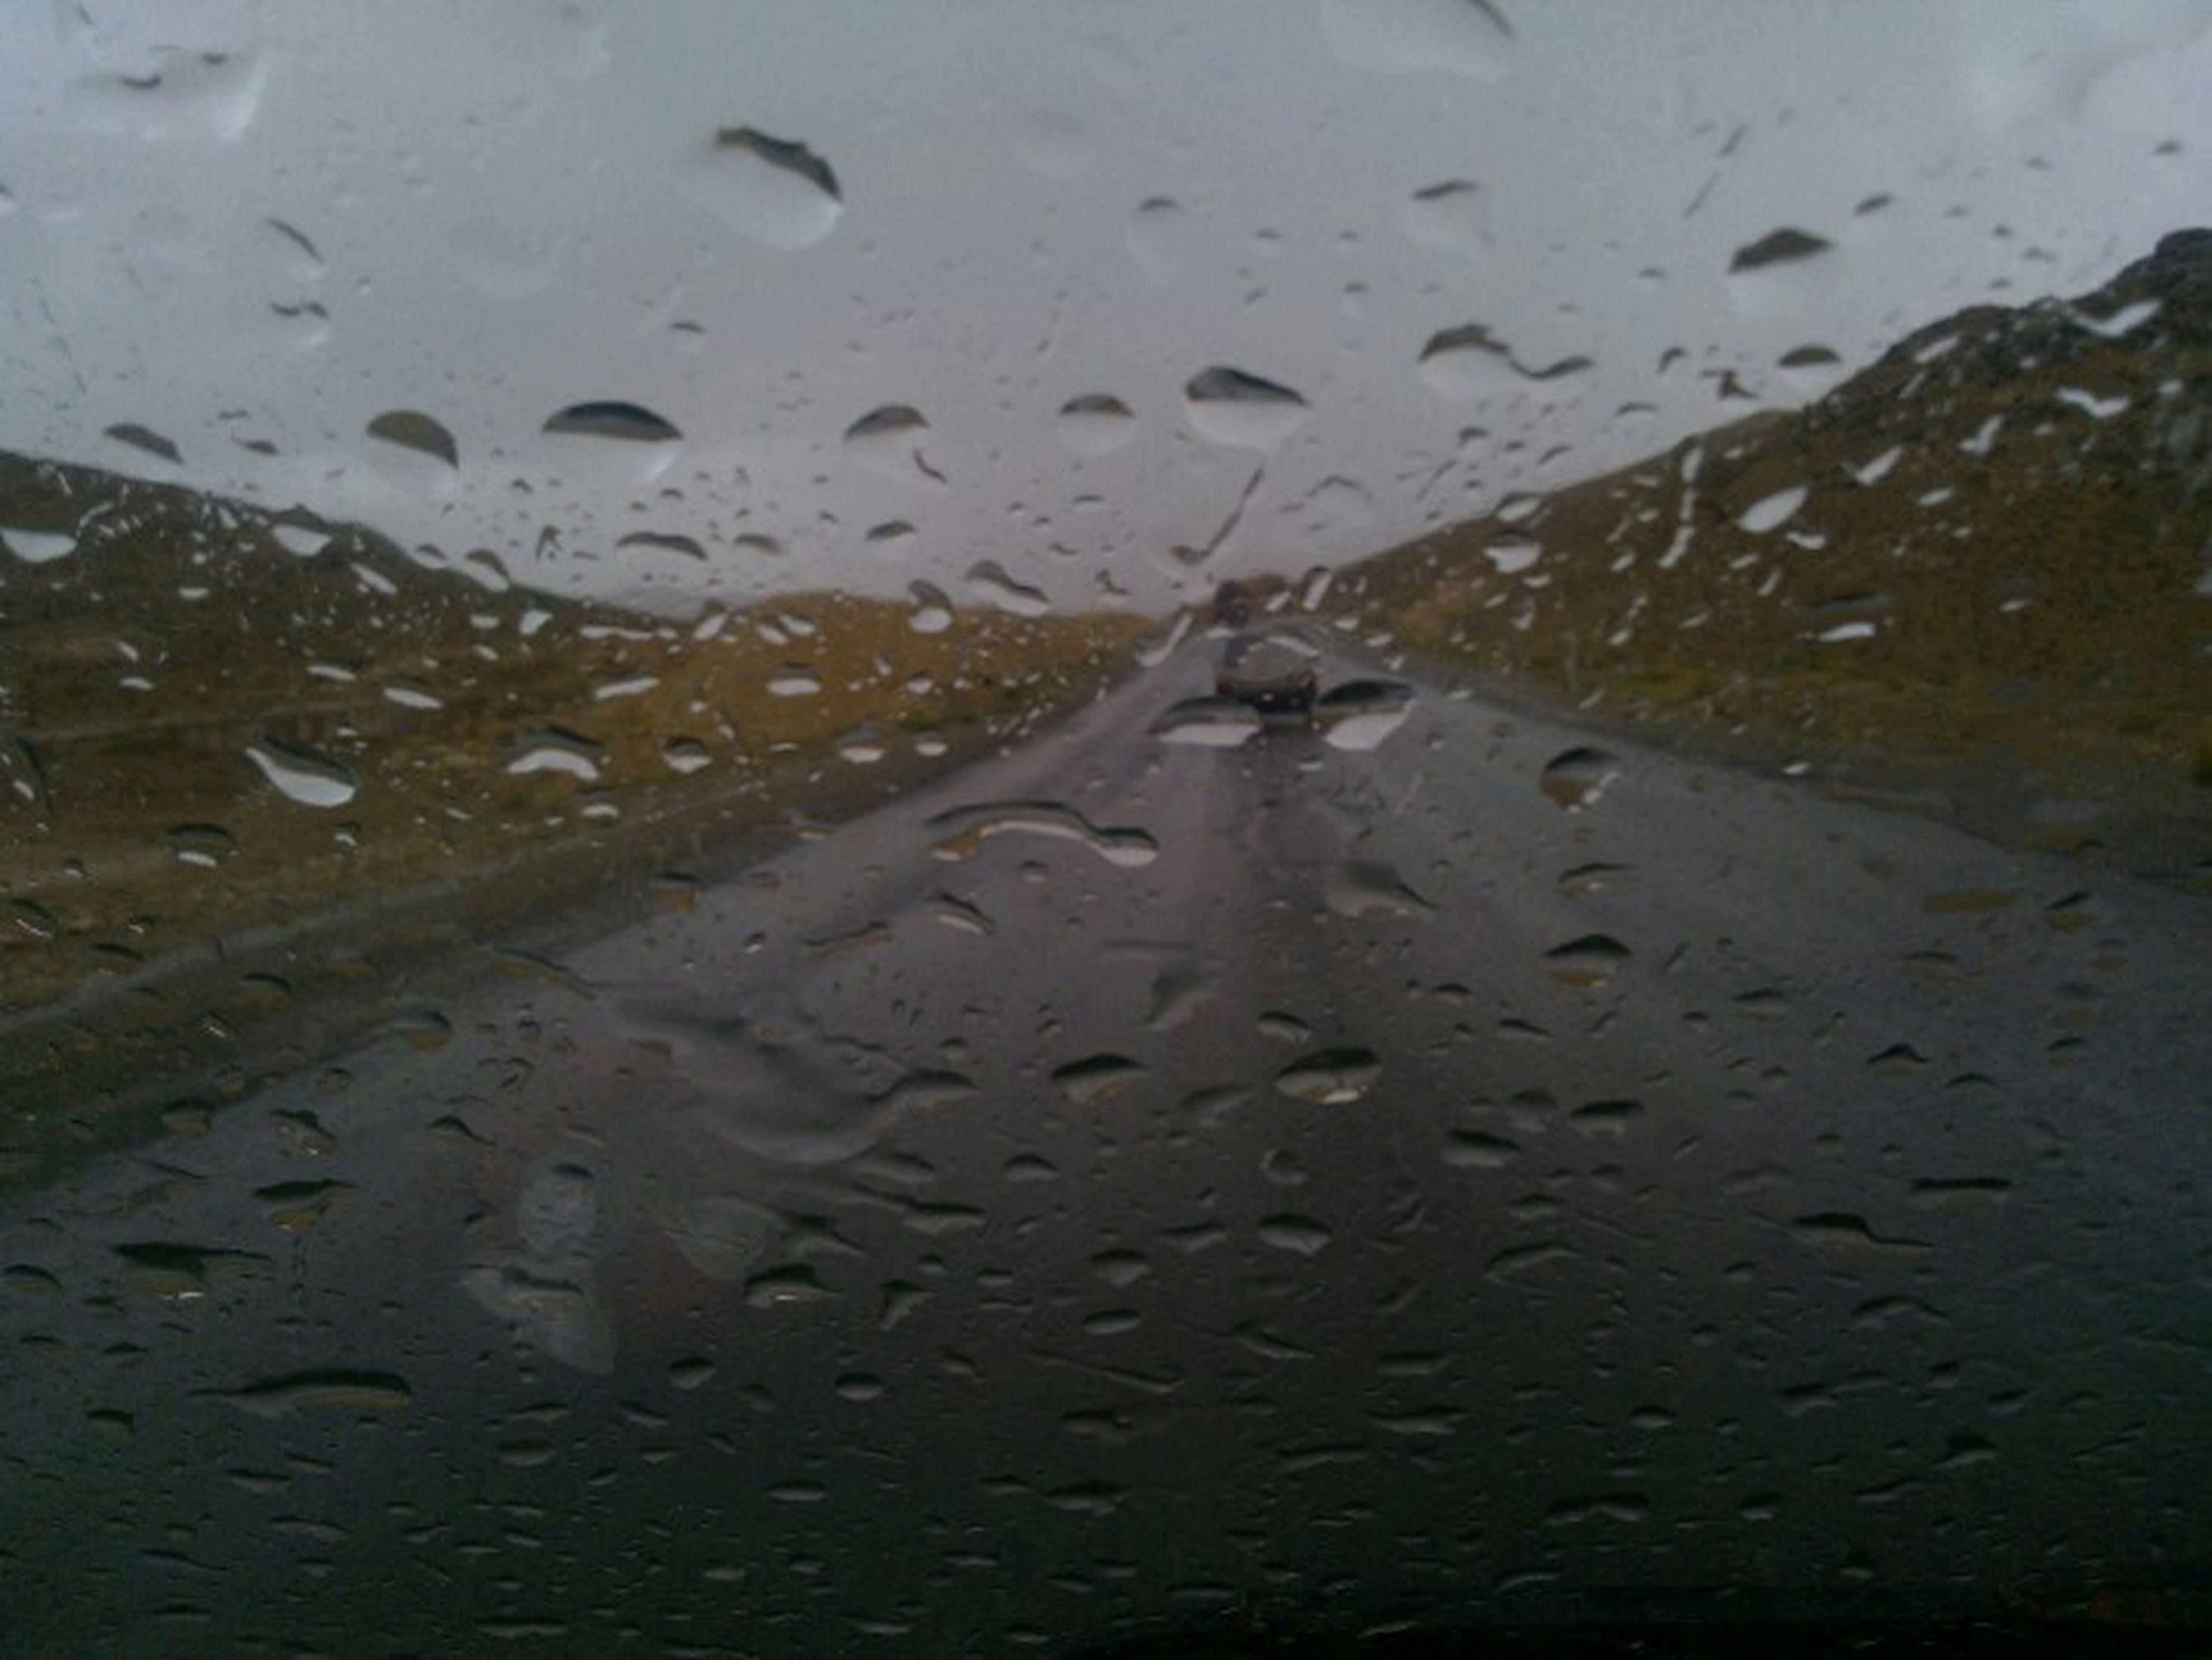 wet, water, rain, transportation, weather, season, drop, street, road, mode of transport, monsoon, the way forward, land vehicle, car, sky, window, raindrop, puddle, reflection, rainy season